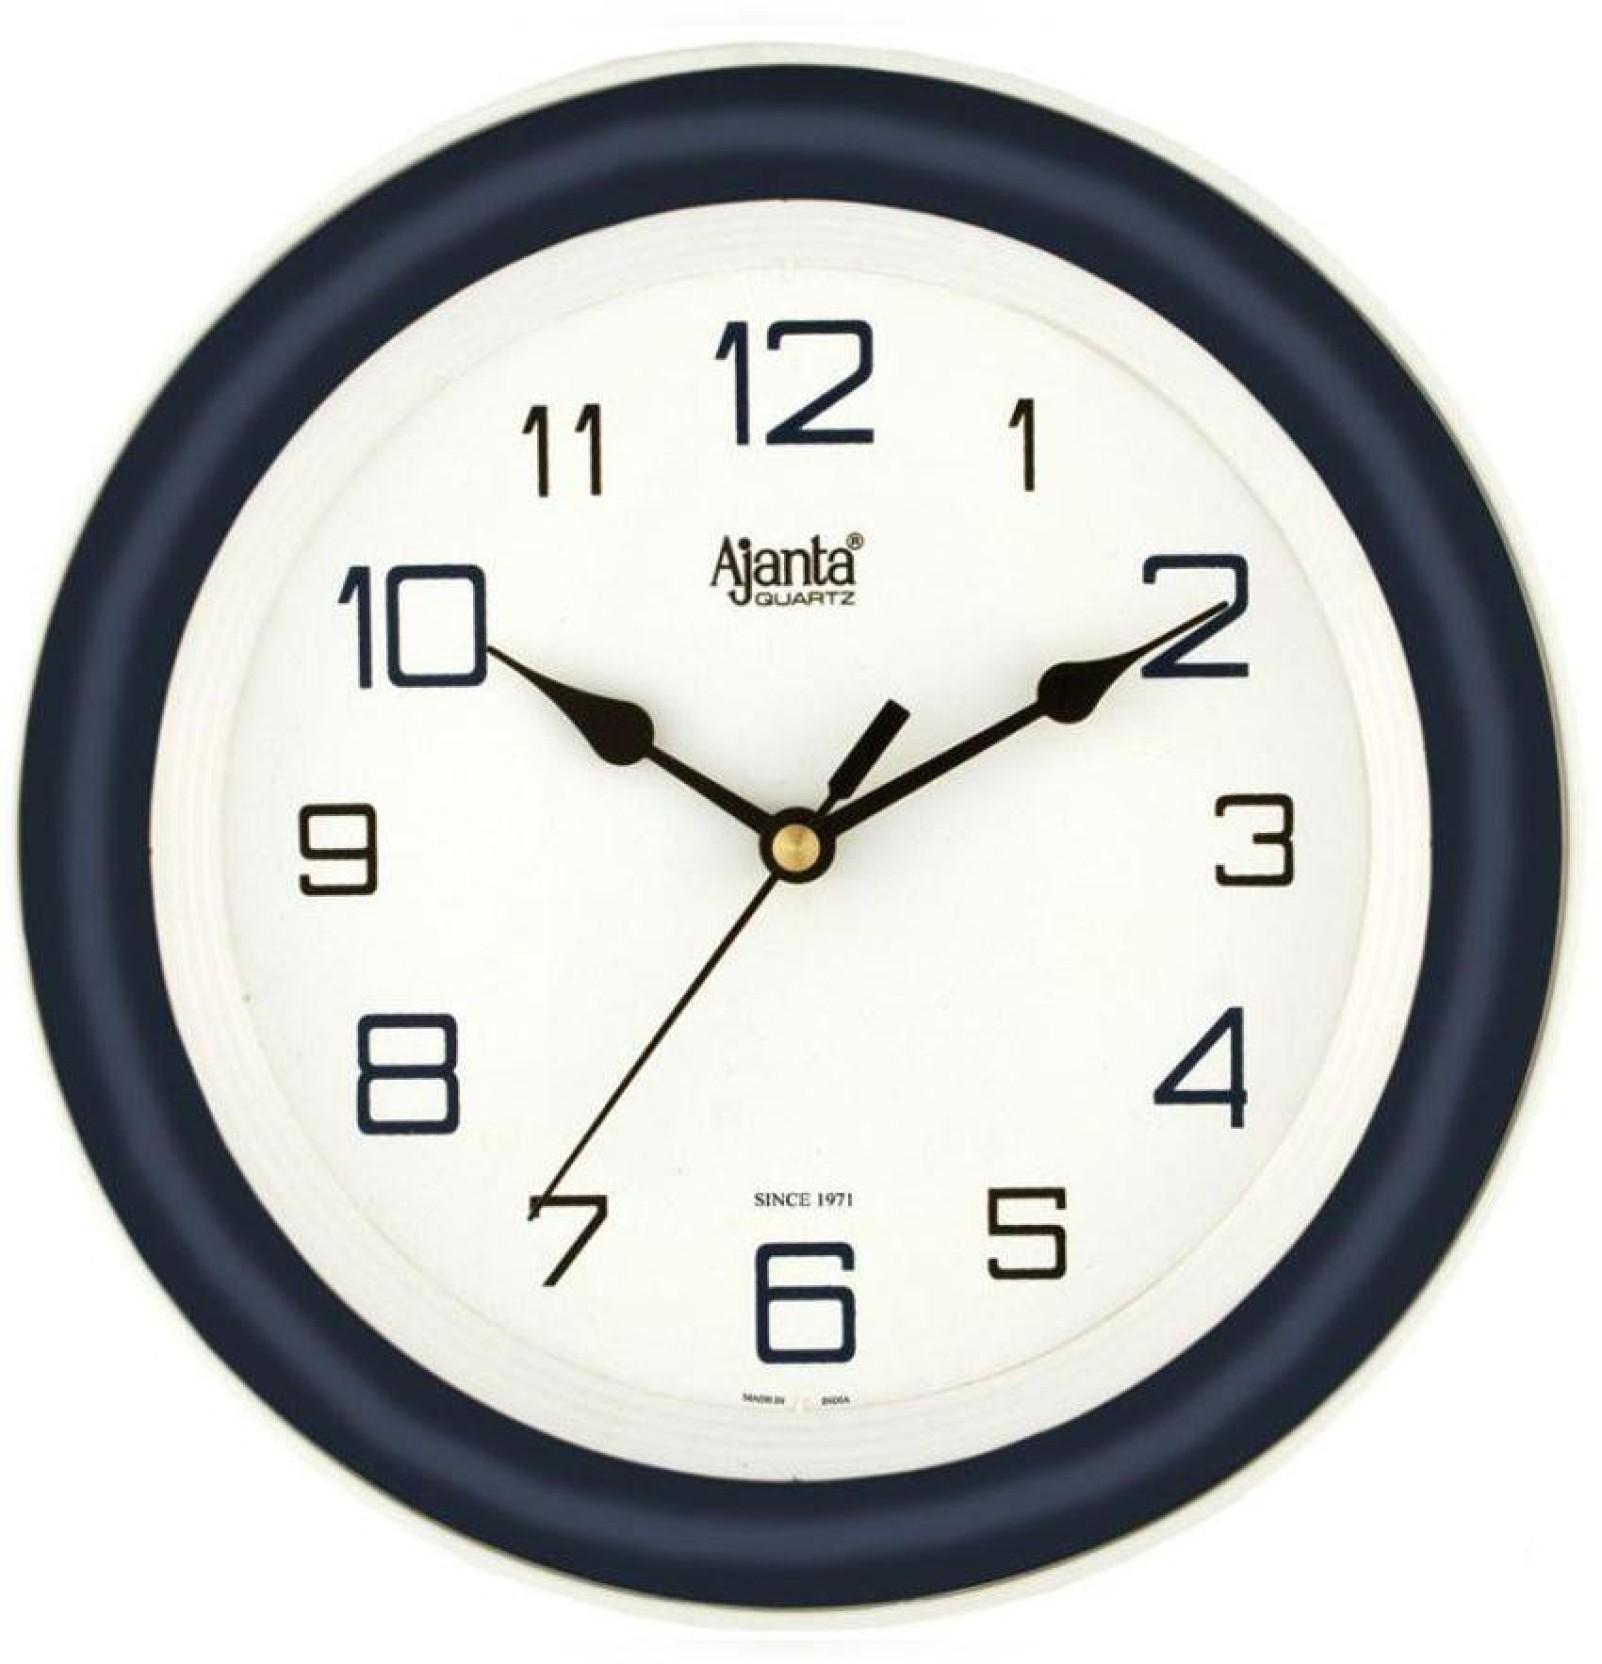 Ajanta analog wall clock price in india buy ajanta analog wall ajanta analog wall clock on offer amipublicfo Images